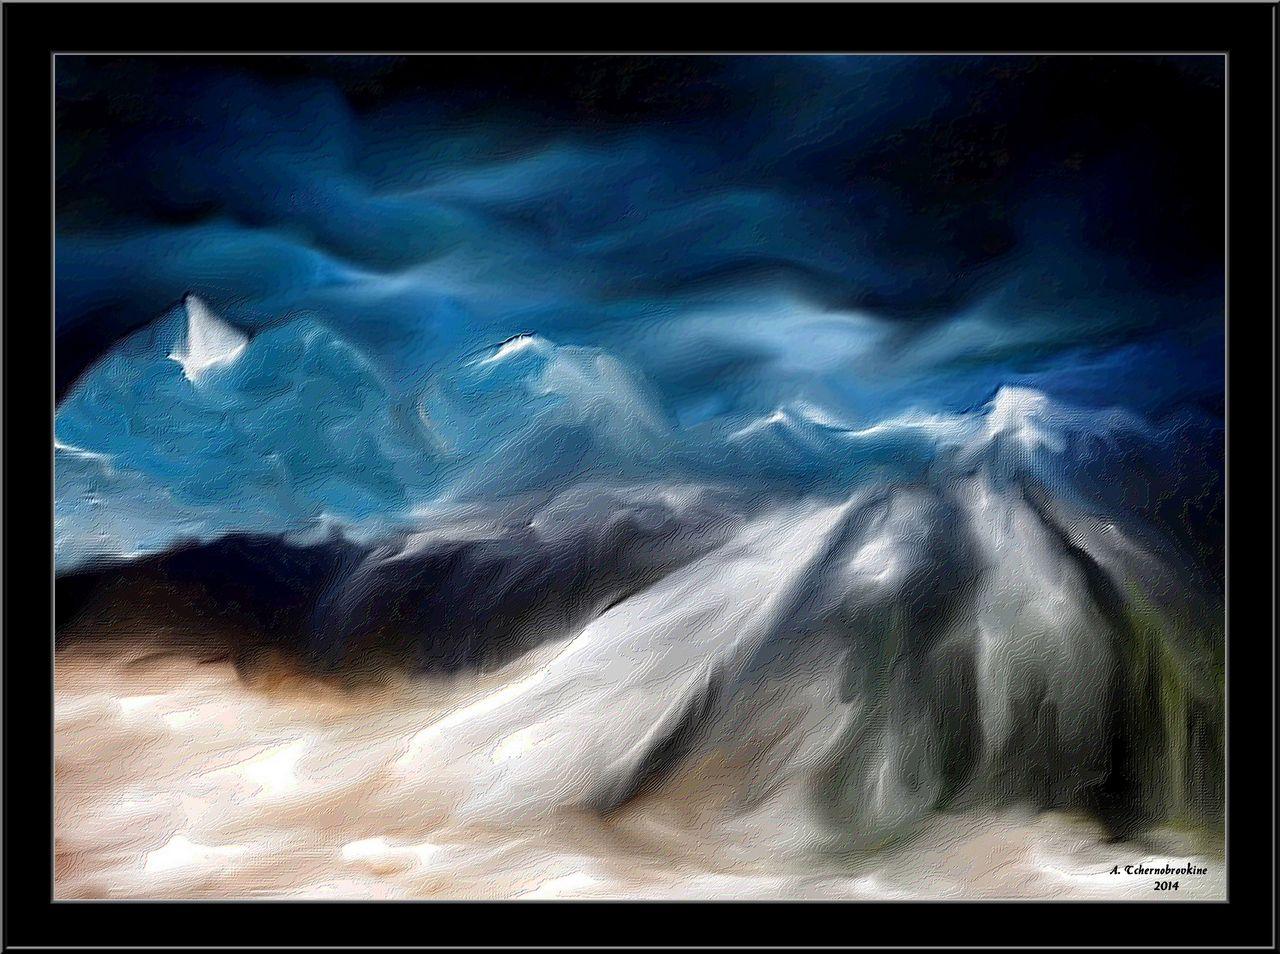 TCHERNOBROVKINE Alexandre Le glacier